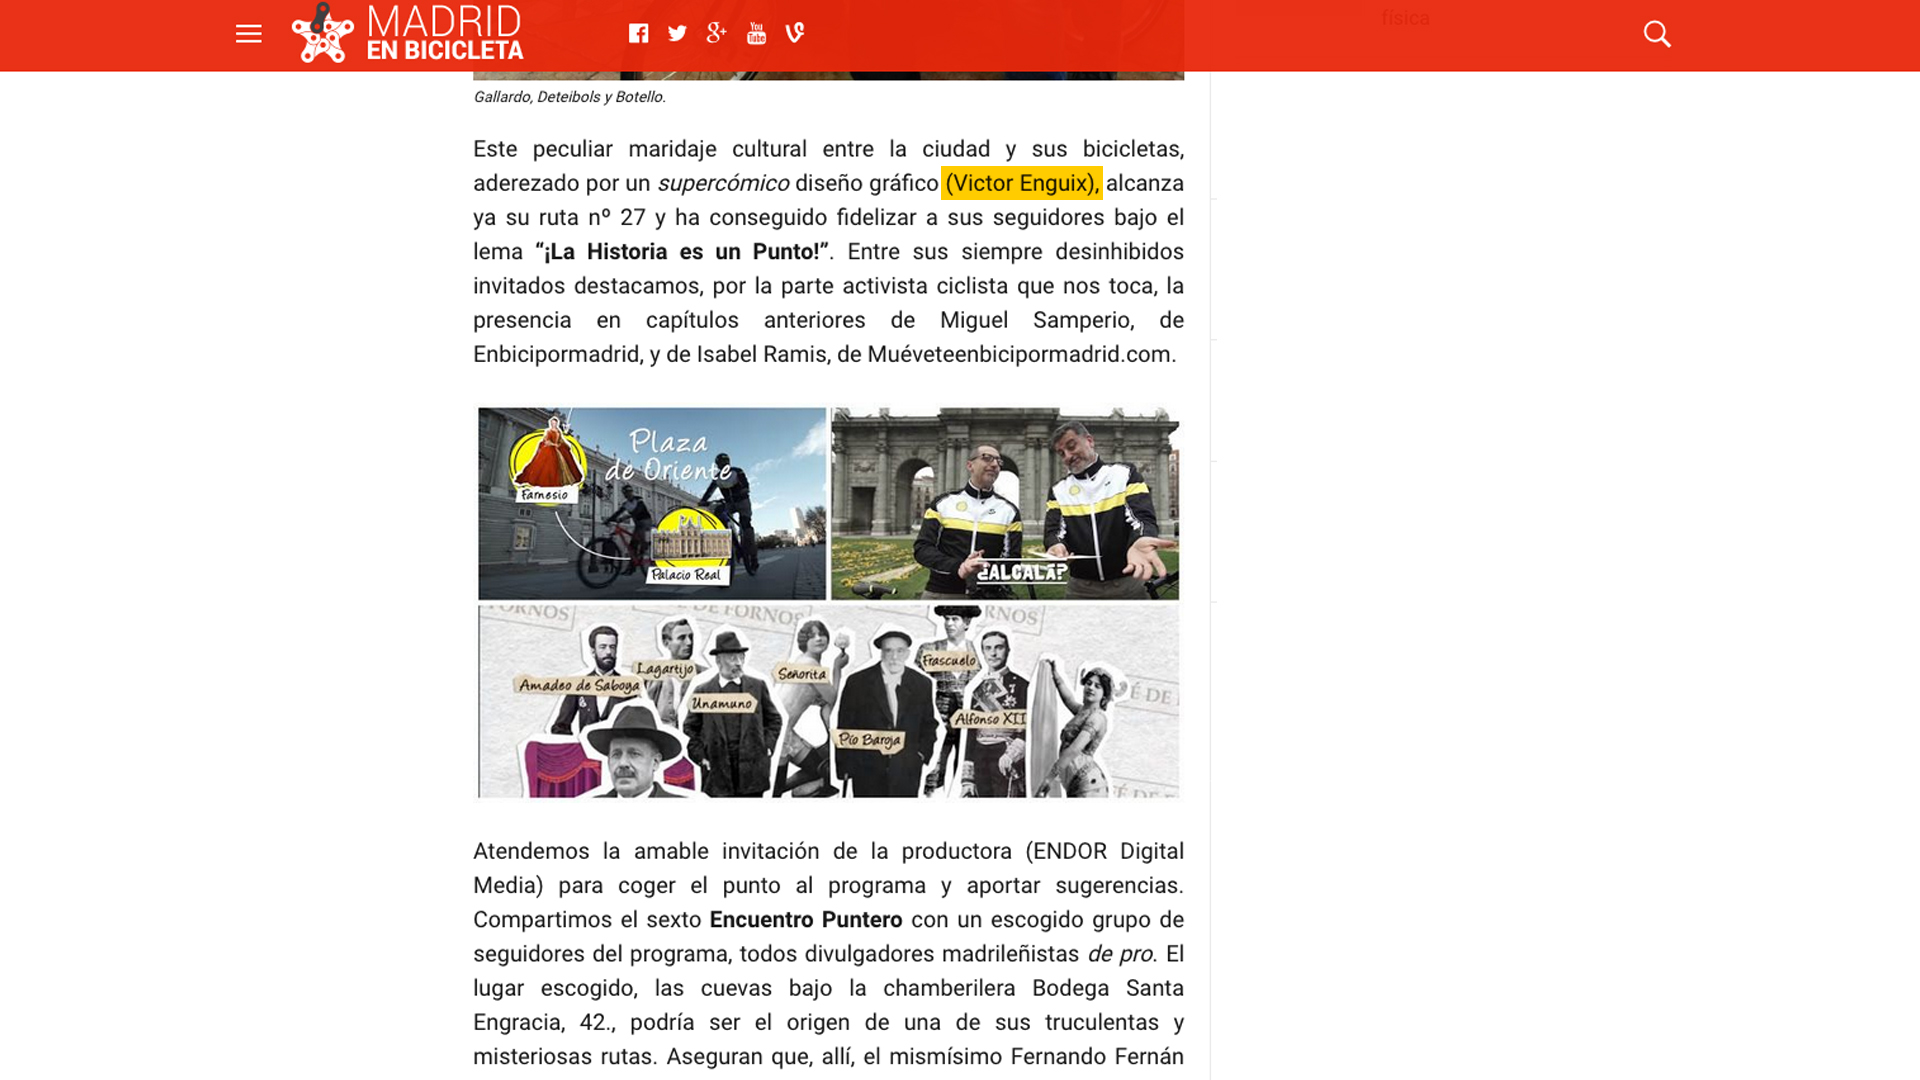 madrid_en_bicicleta_victor_enguix_diseñador.jpg